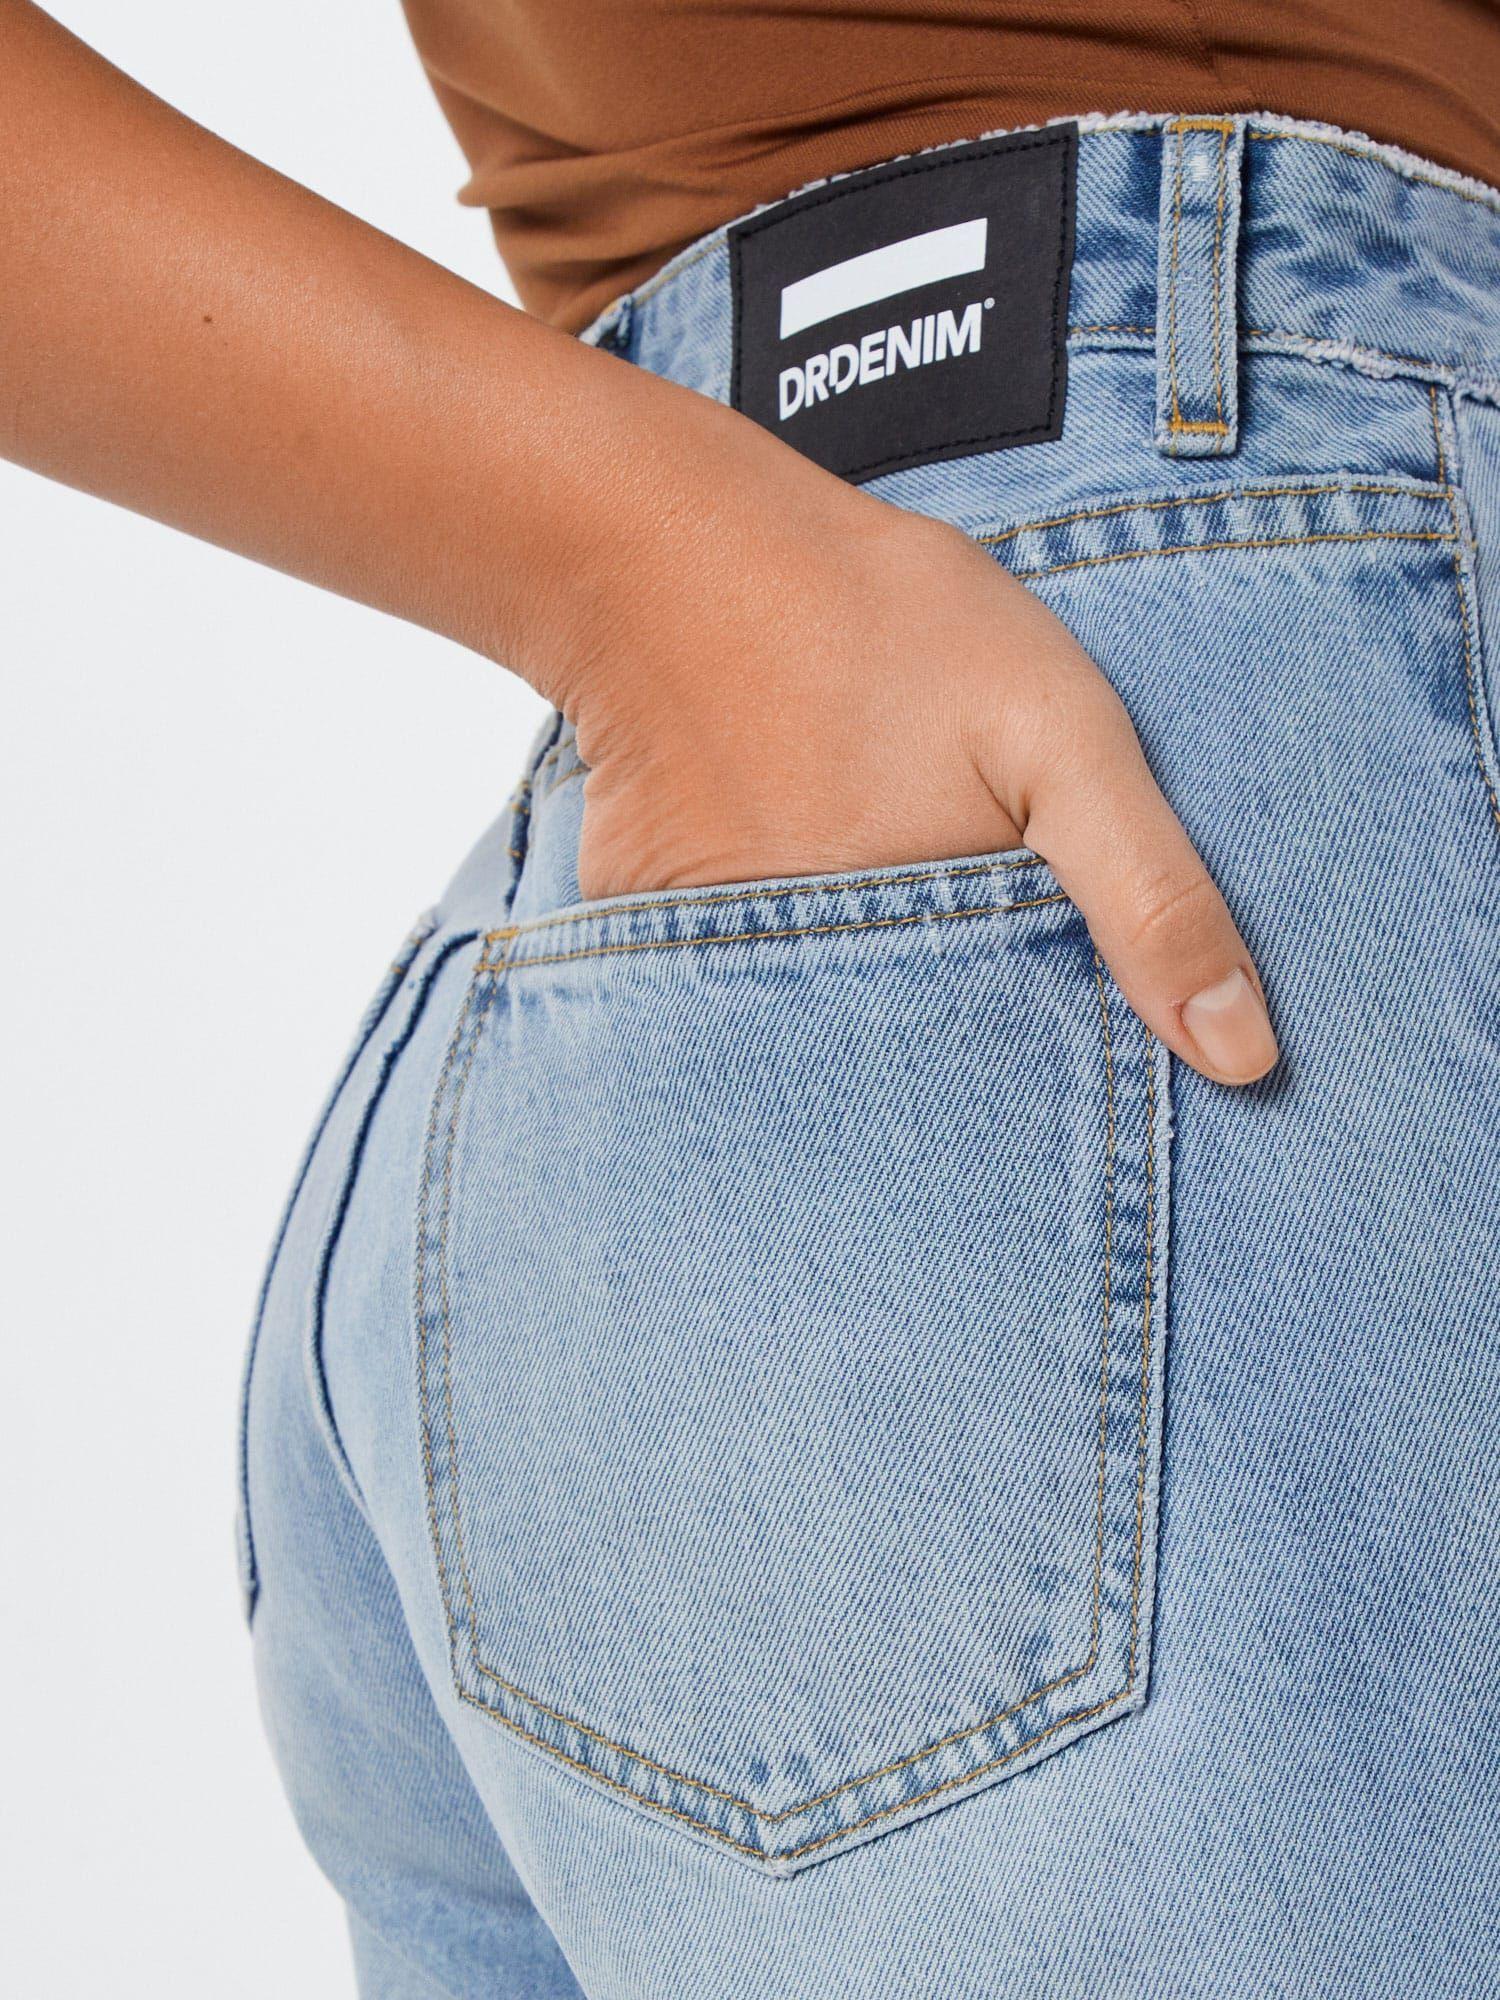 Dr. Denim Jeans 'Aiko' Damen, Blue Denim, Größe 29